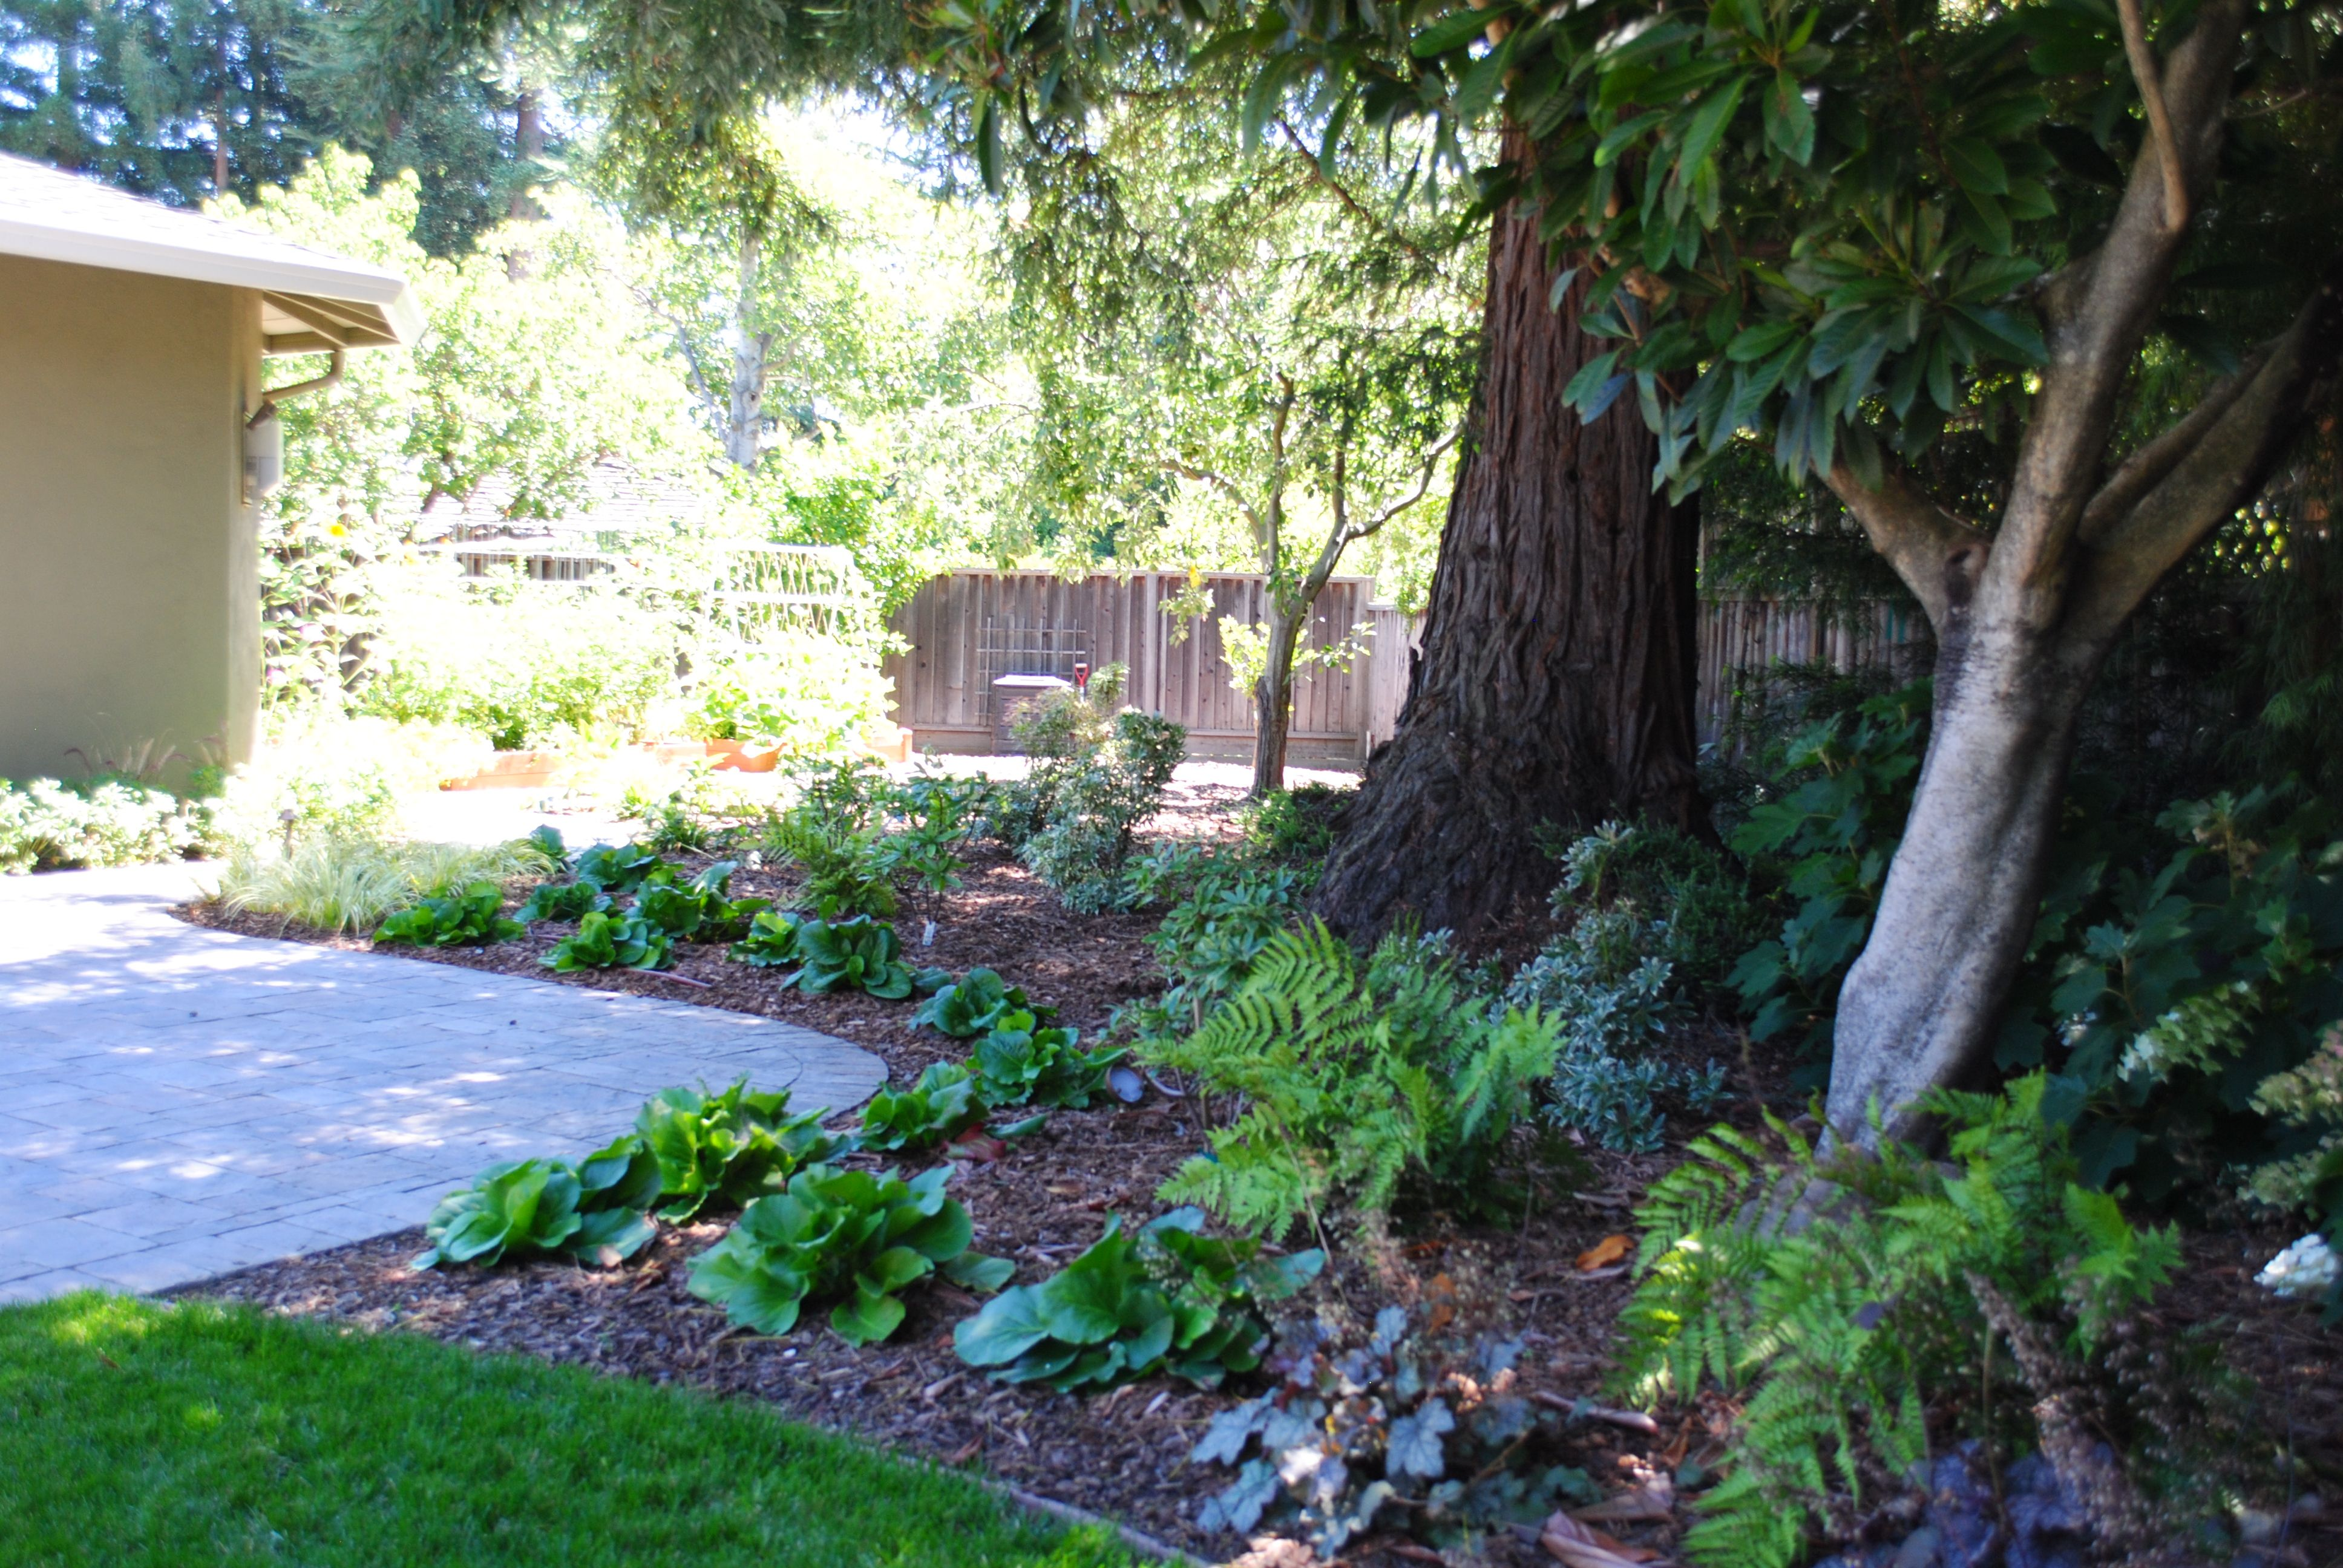 landscaping in shade garden